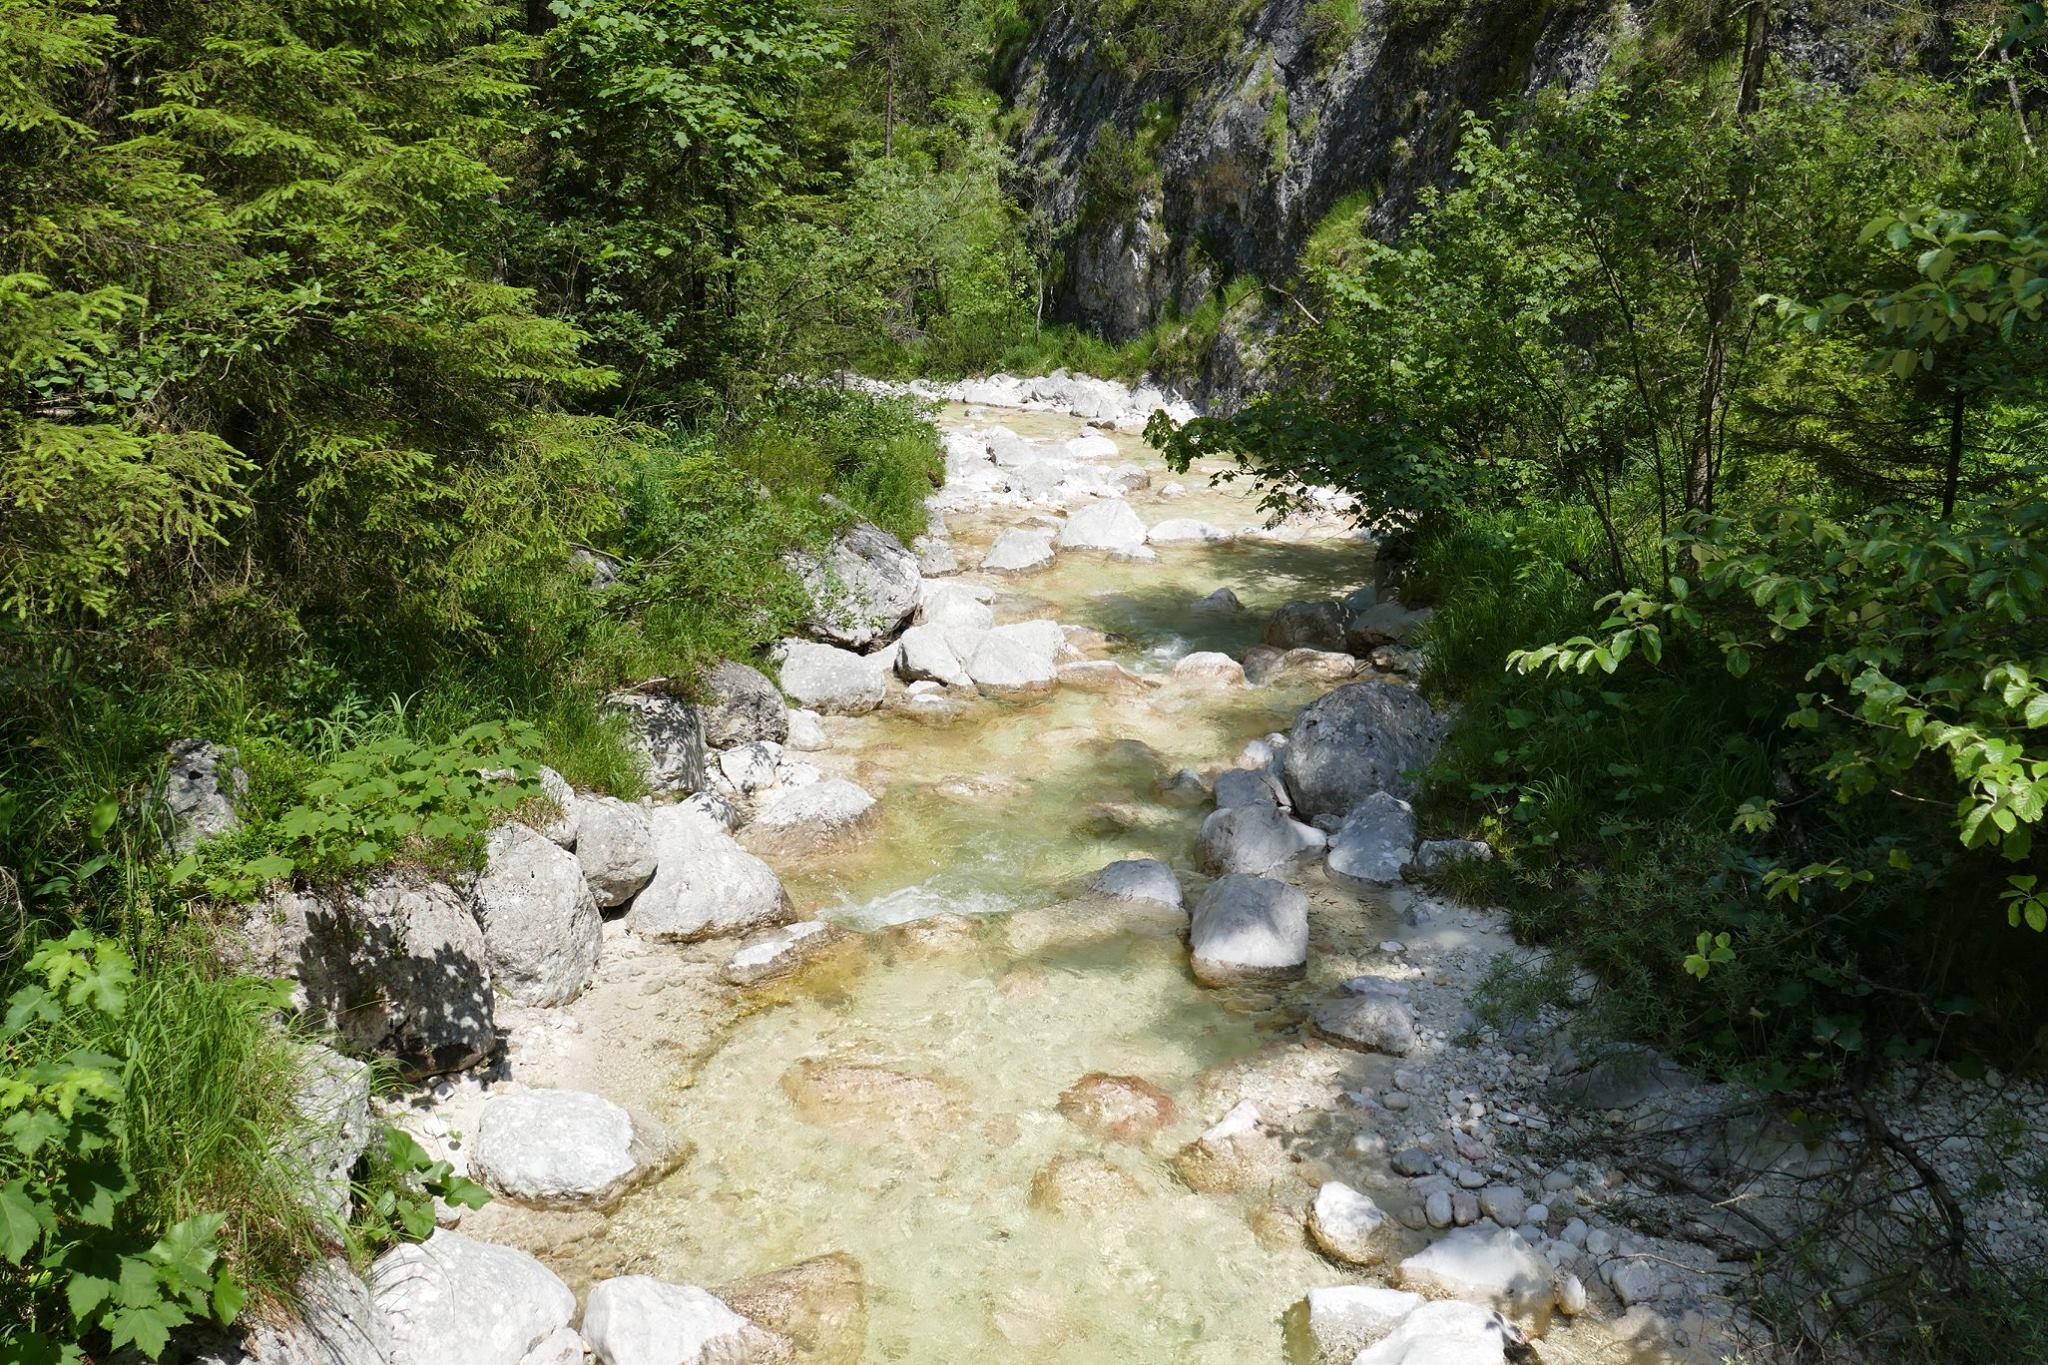 Goldprospektion Alpen Juni 2016 (3) - Torsten Marx